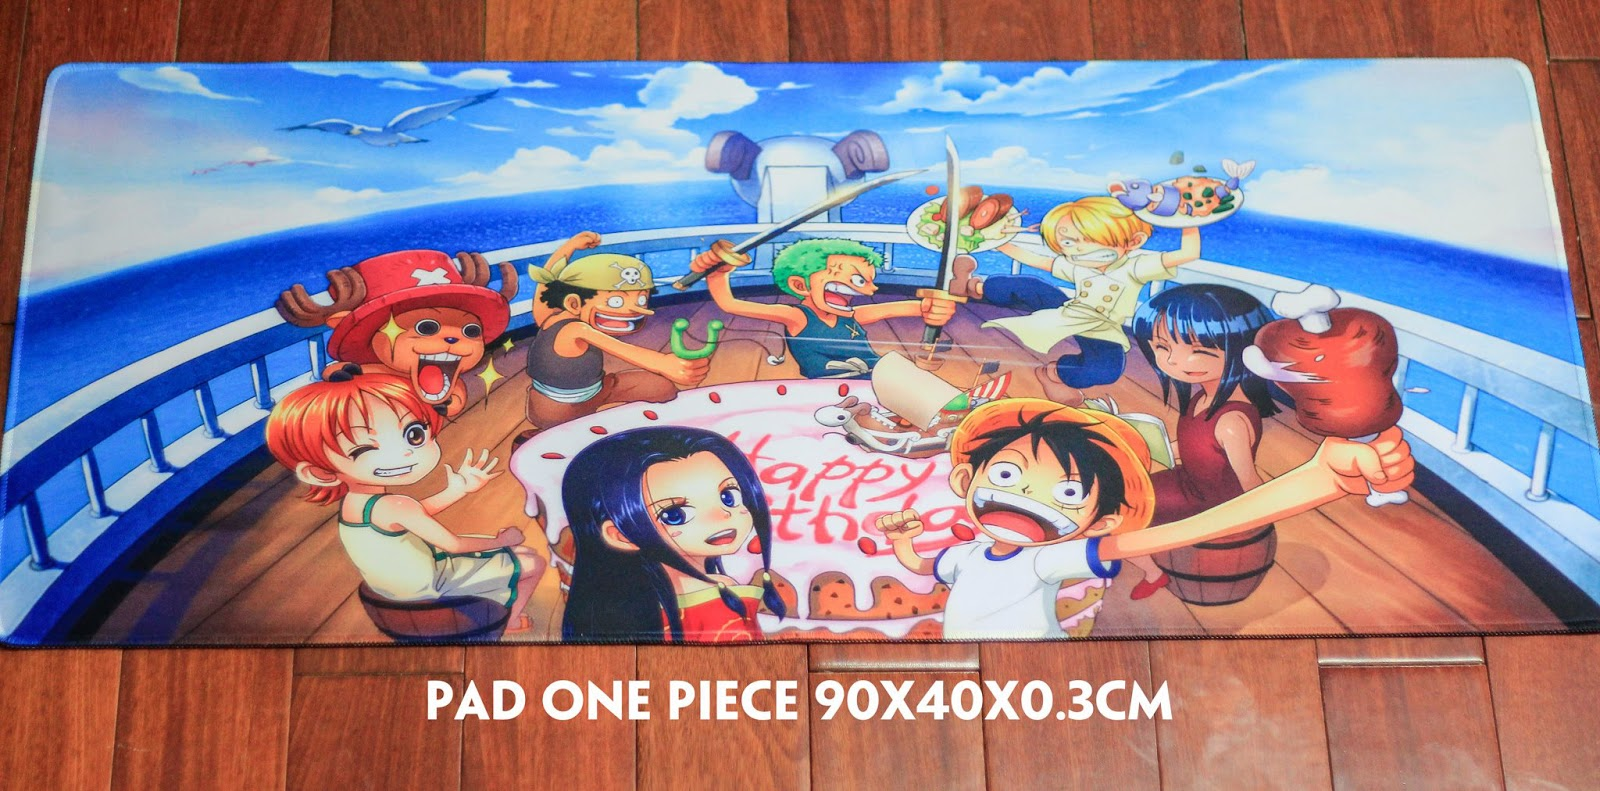 Gamming Mousepad: One piece, CS, CF, LMHT, Doraemon, Naruto, Dota2!!! - 3